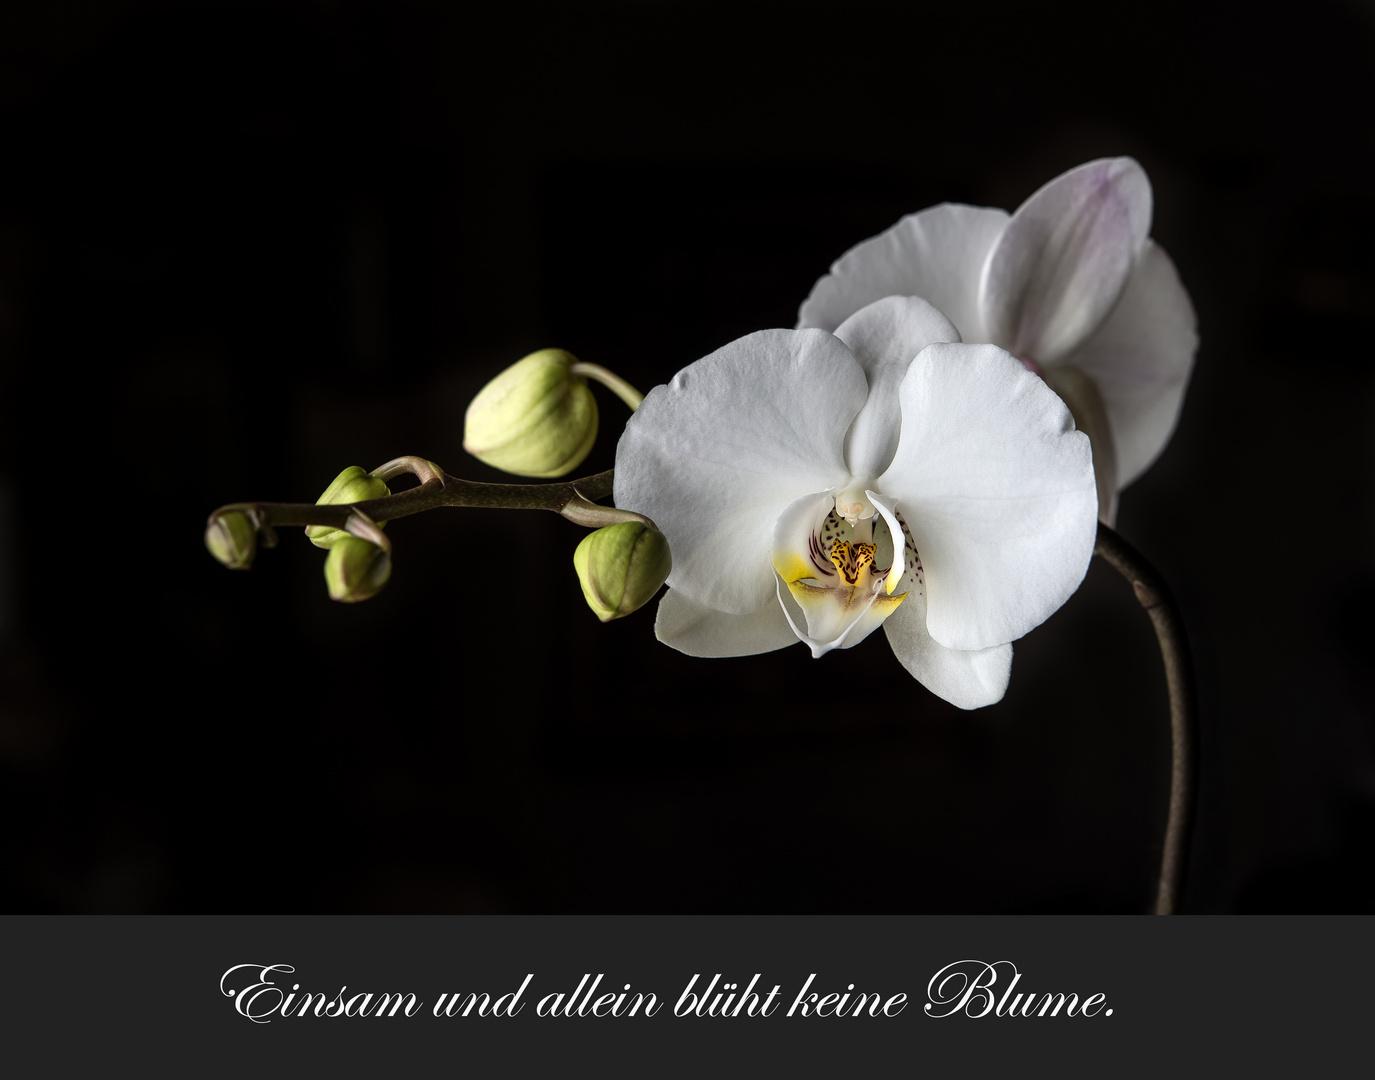 ich w nsche euch allen einen sch nen abend foto bild pflanzen pilze flechten bl ten. Black Bedroom Furniture Sets. Home Design Ideas